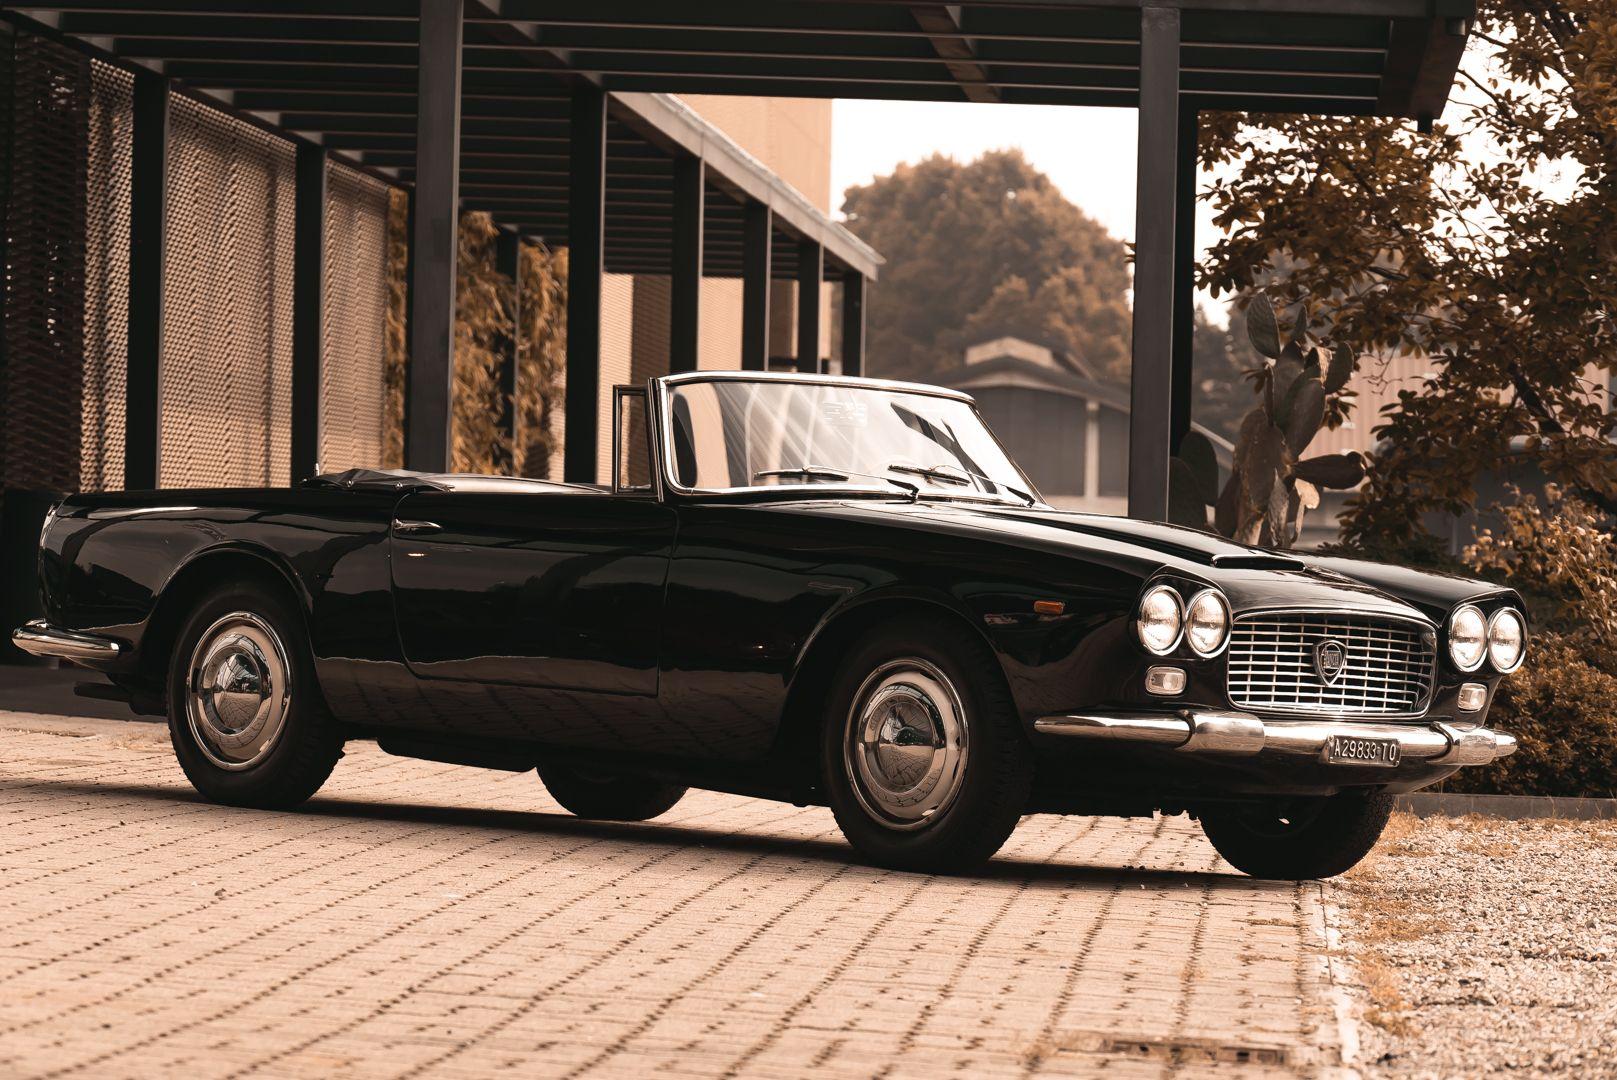 1968 Lancia Flaminia Touring Convertible 2800 3C 79117